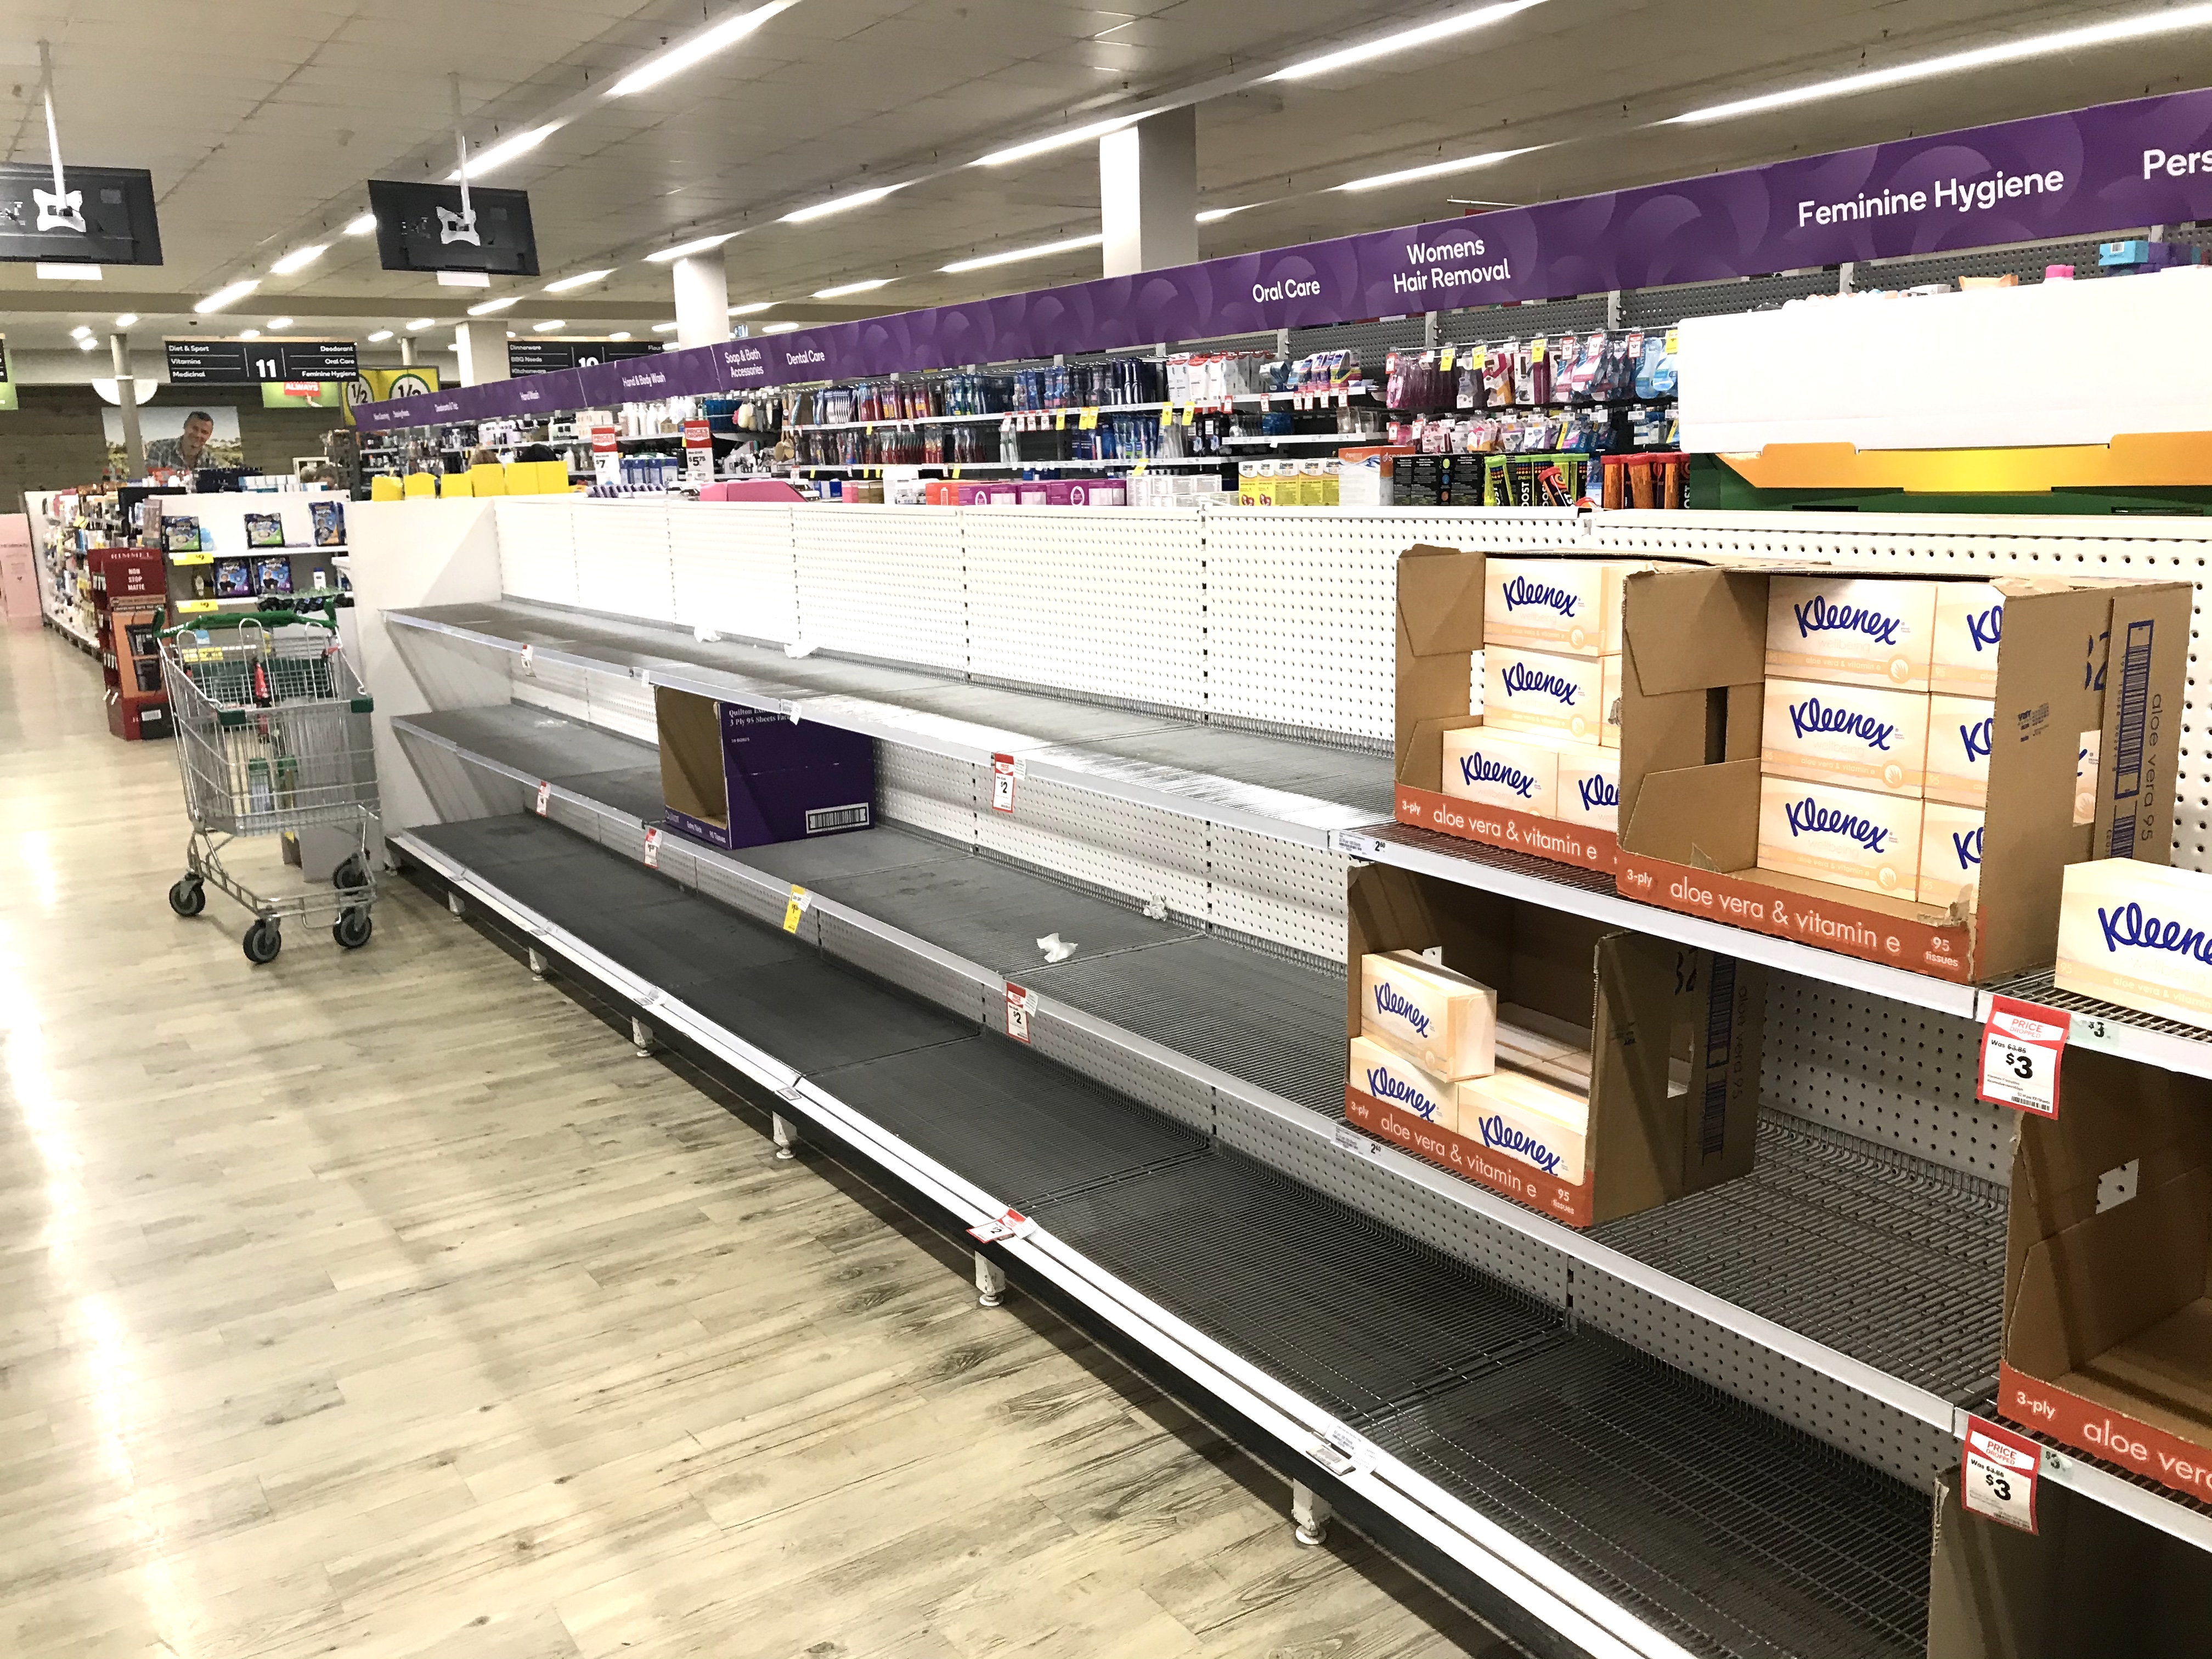 Bare toilet paper and tissue shelves in Sydney supermarket.